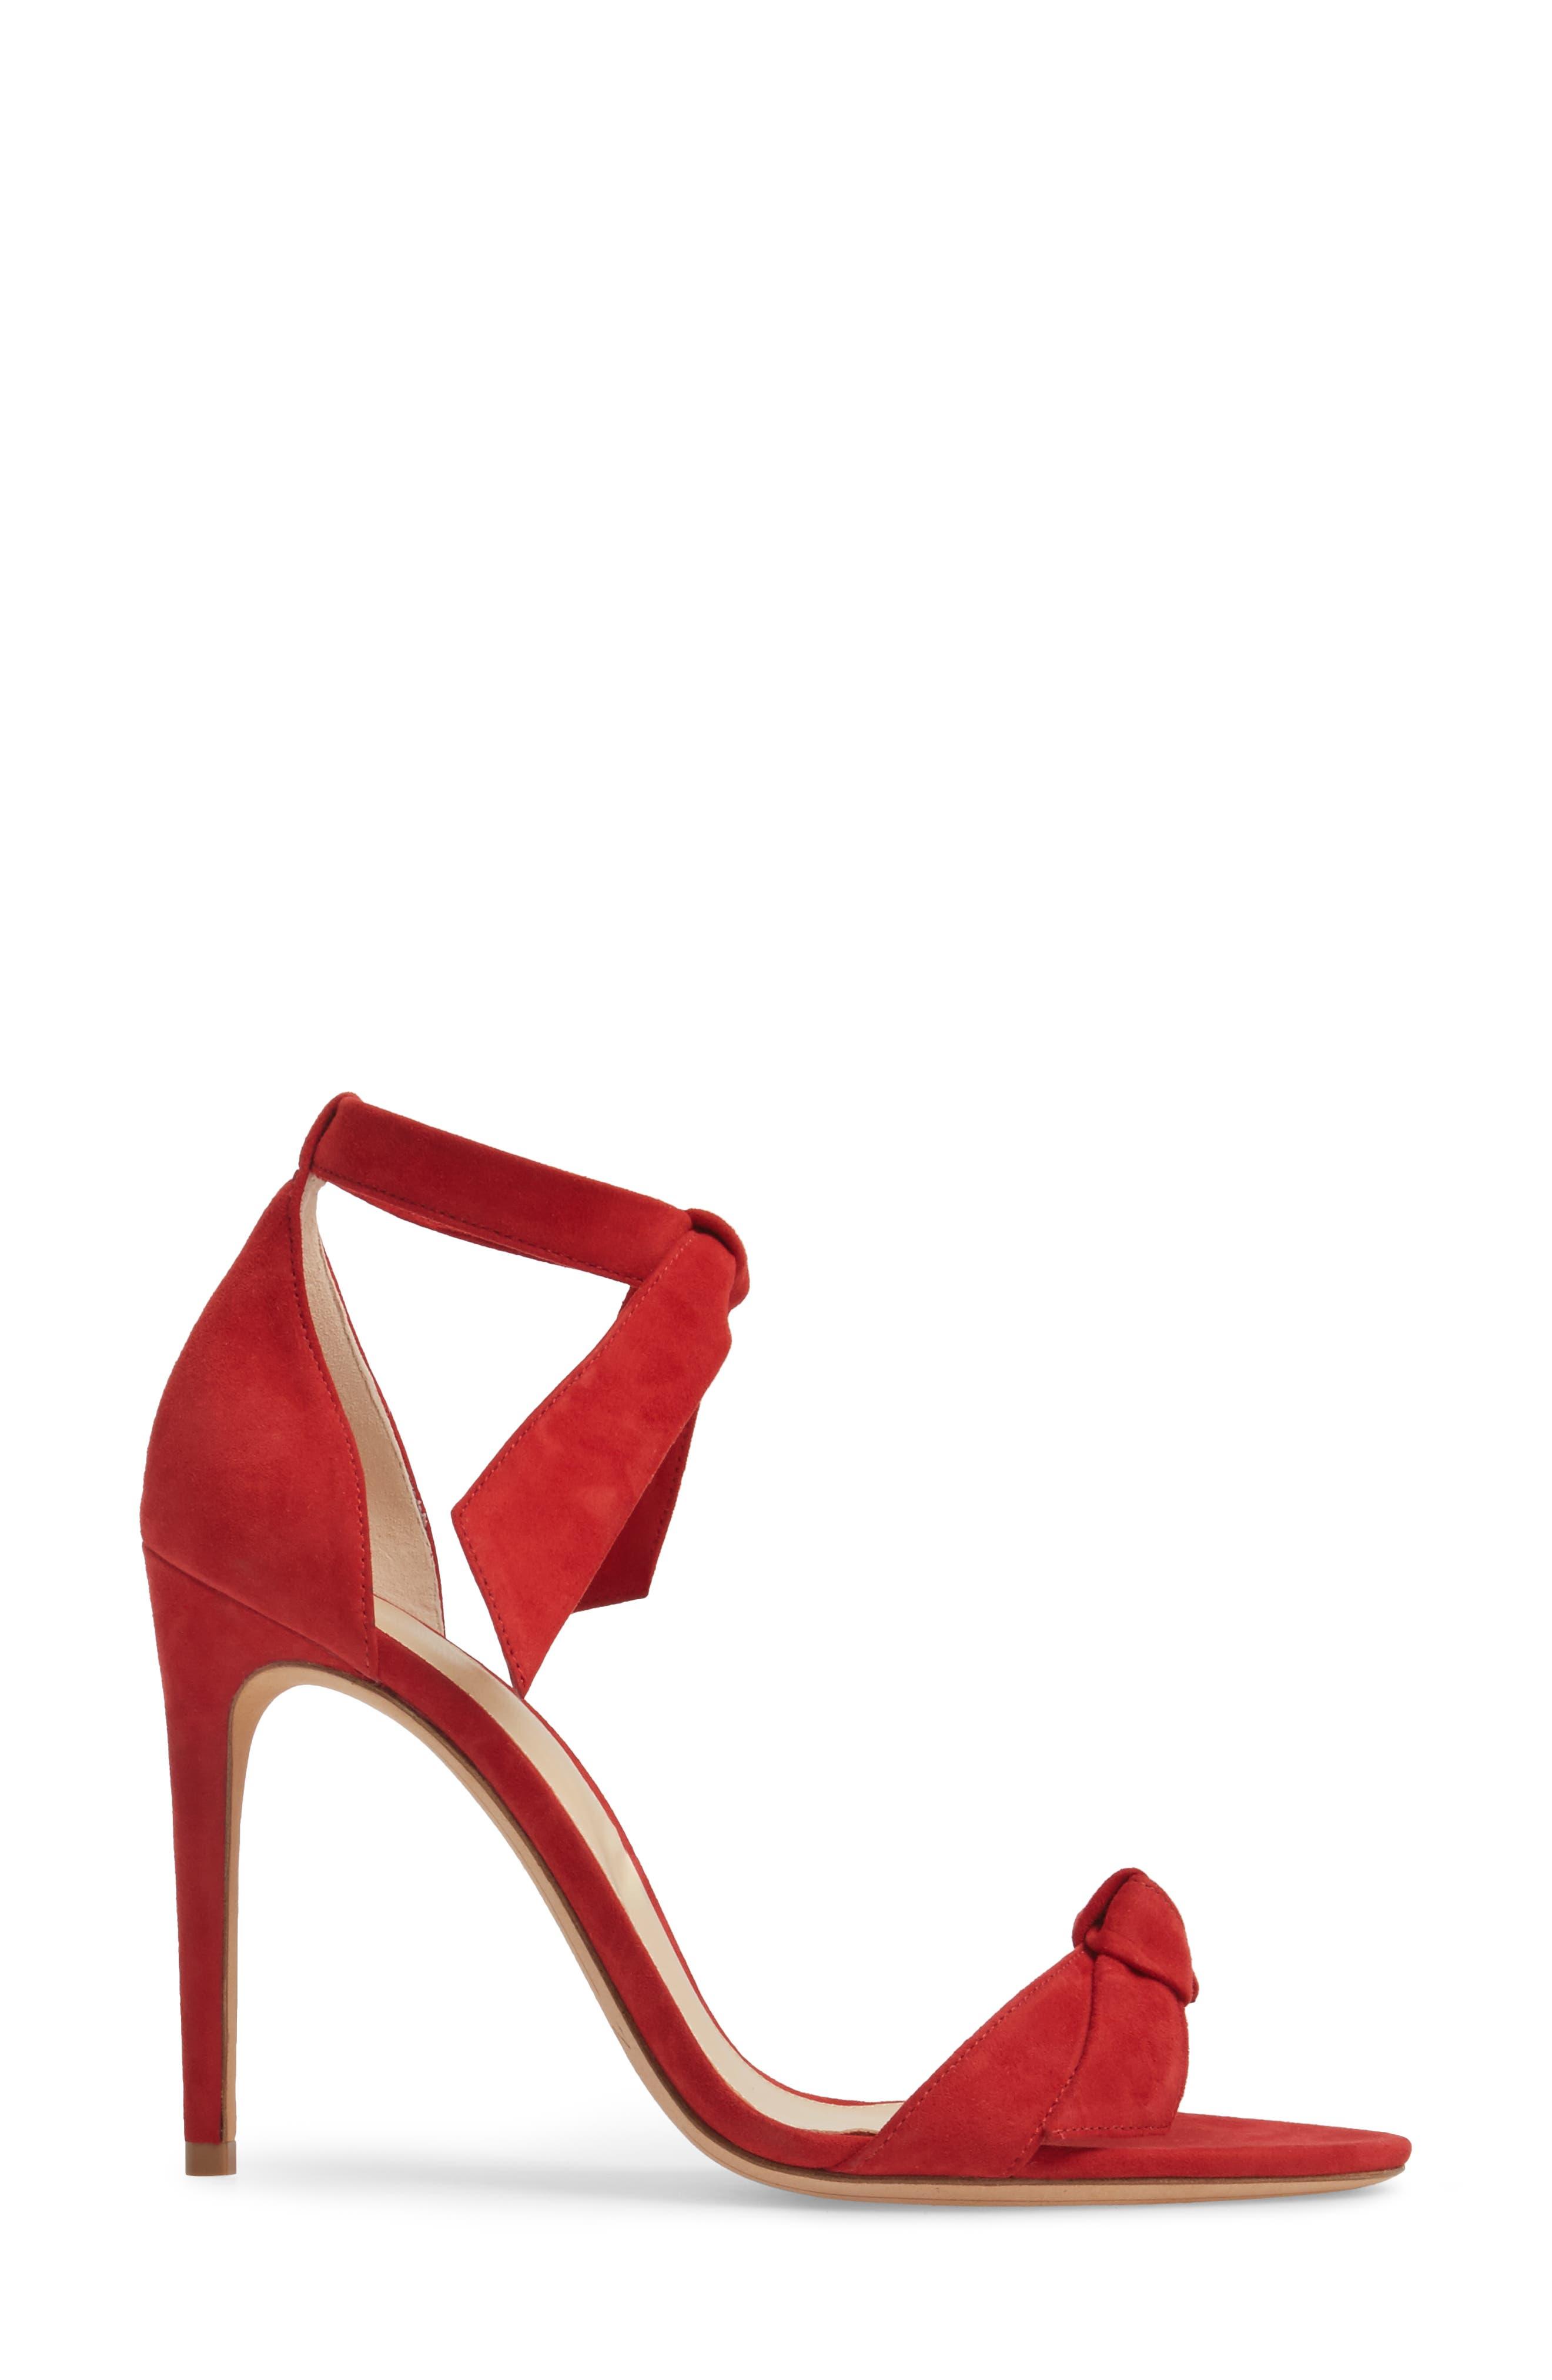 'Clarita' Ankle Tie Sandal,                             Alternate thumbnail 3, color,                             FLAME SUEDE